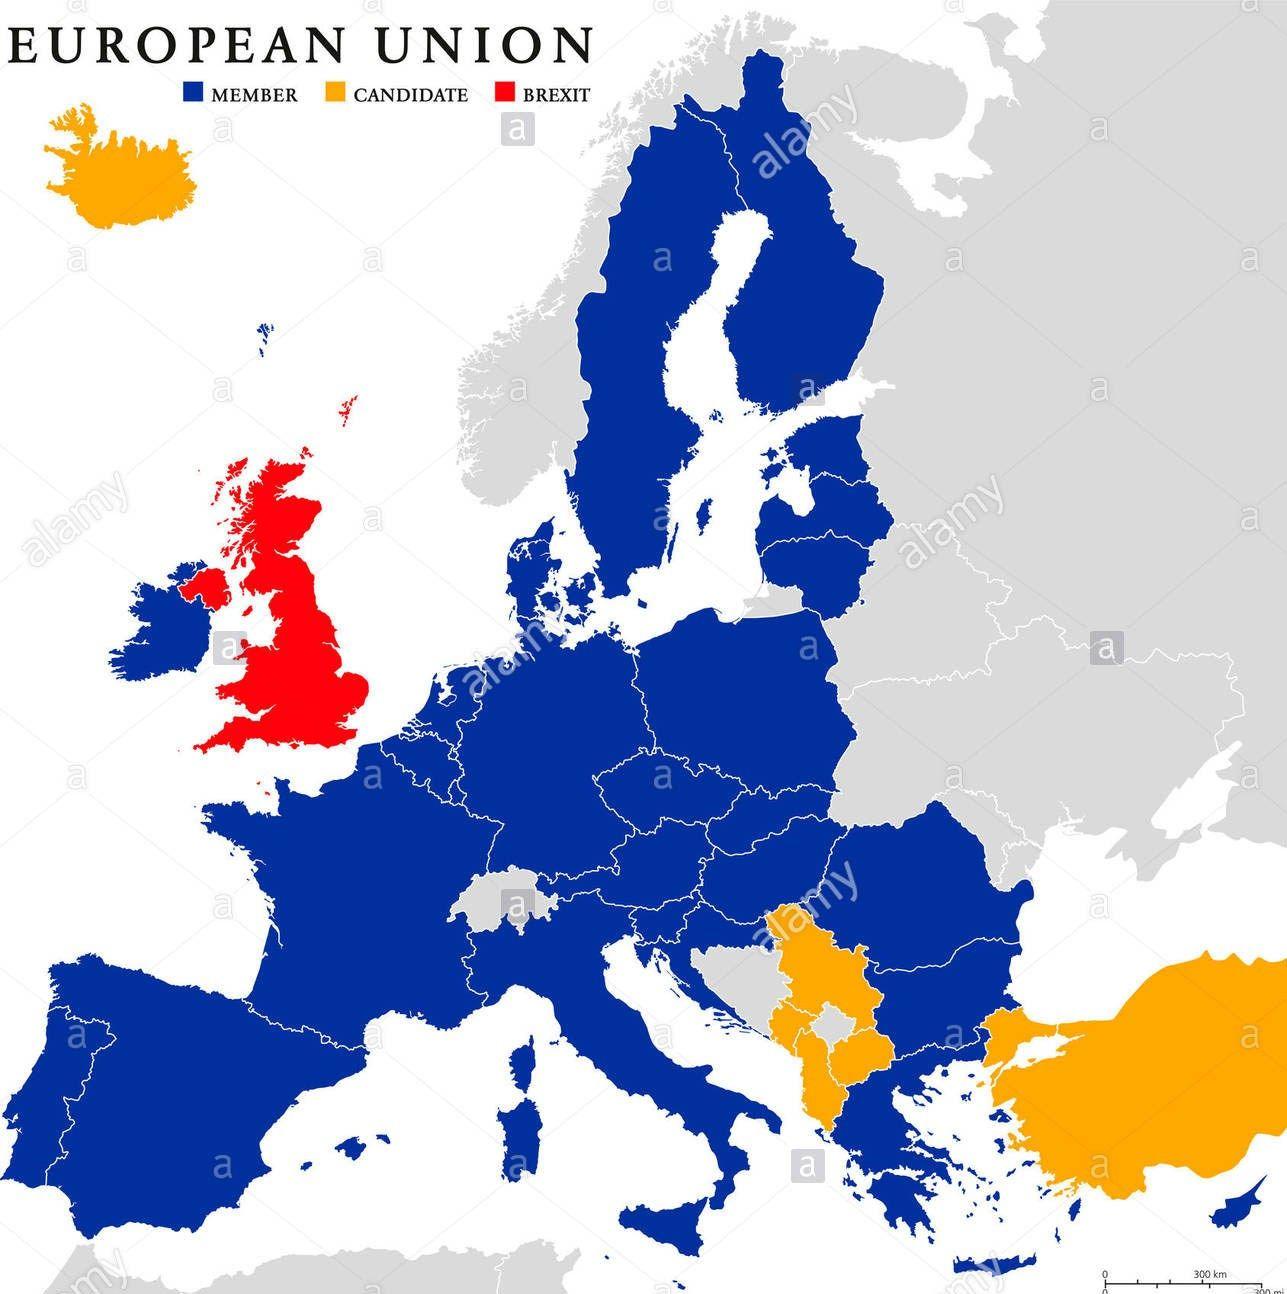 Etnosentrisme Biang Disintegrasi Eropa Oleh Alfin Febrian Basundoro